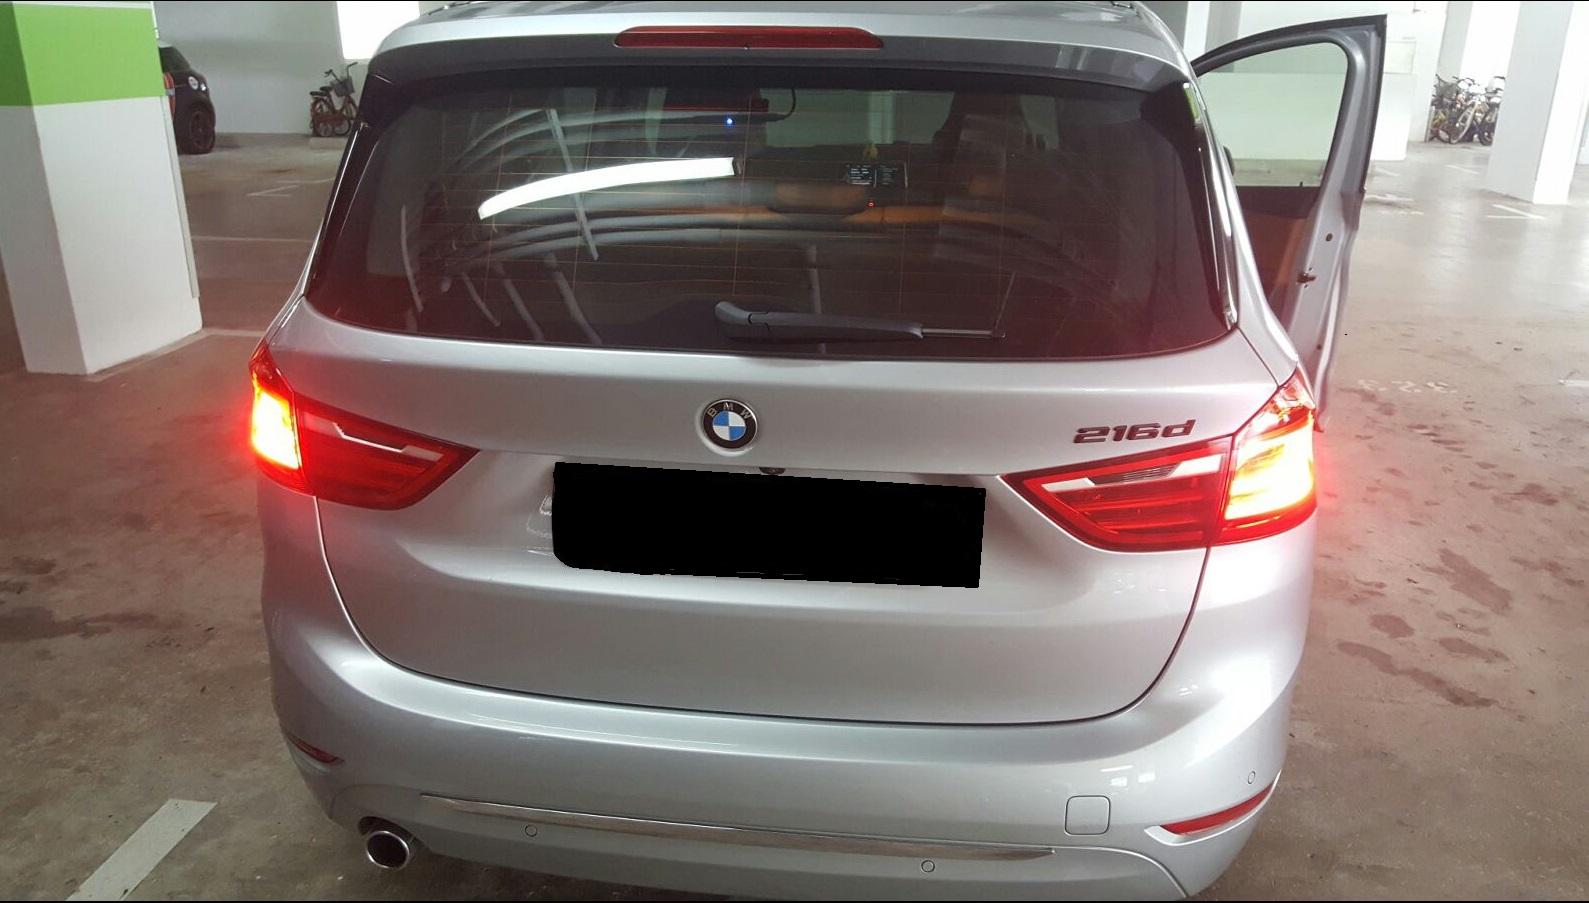 BMW Coding for F45, F46, F48 (Active Tourer / Gran Tourer / X1